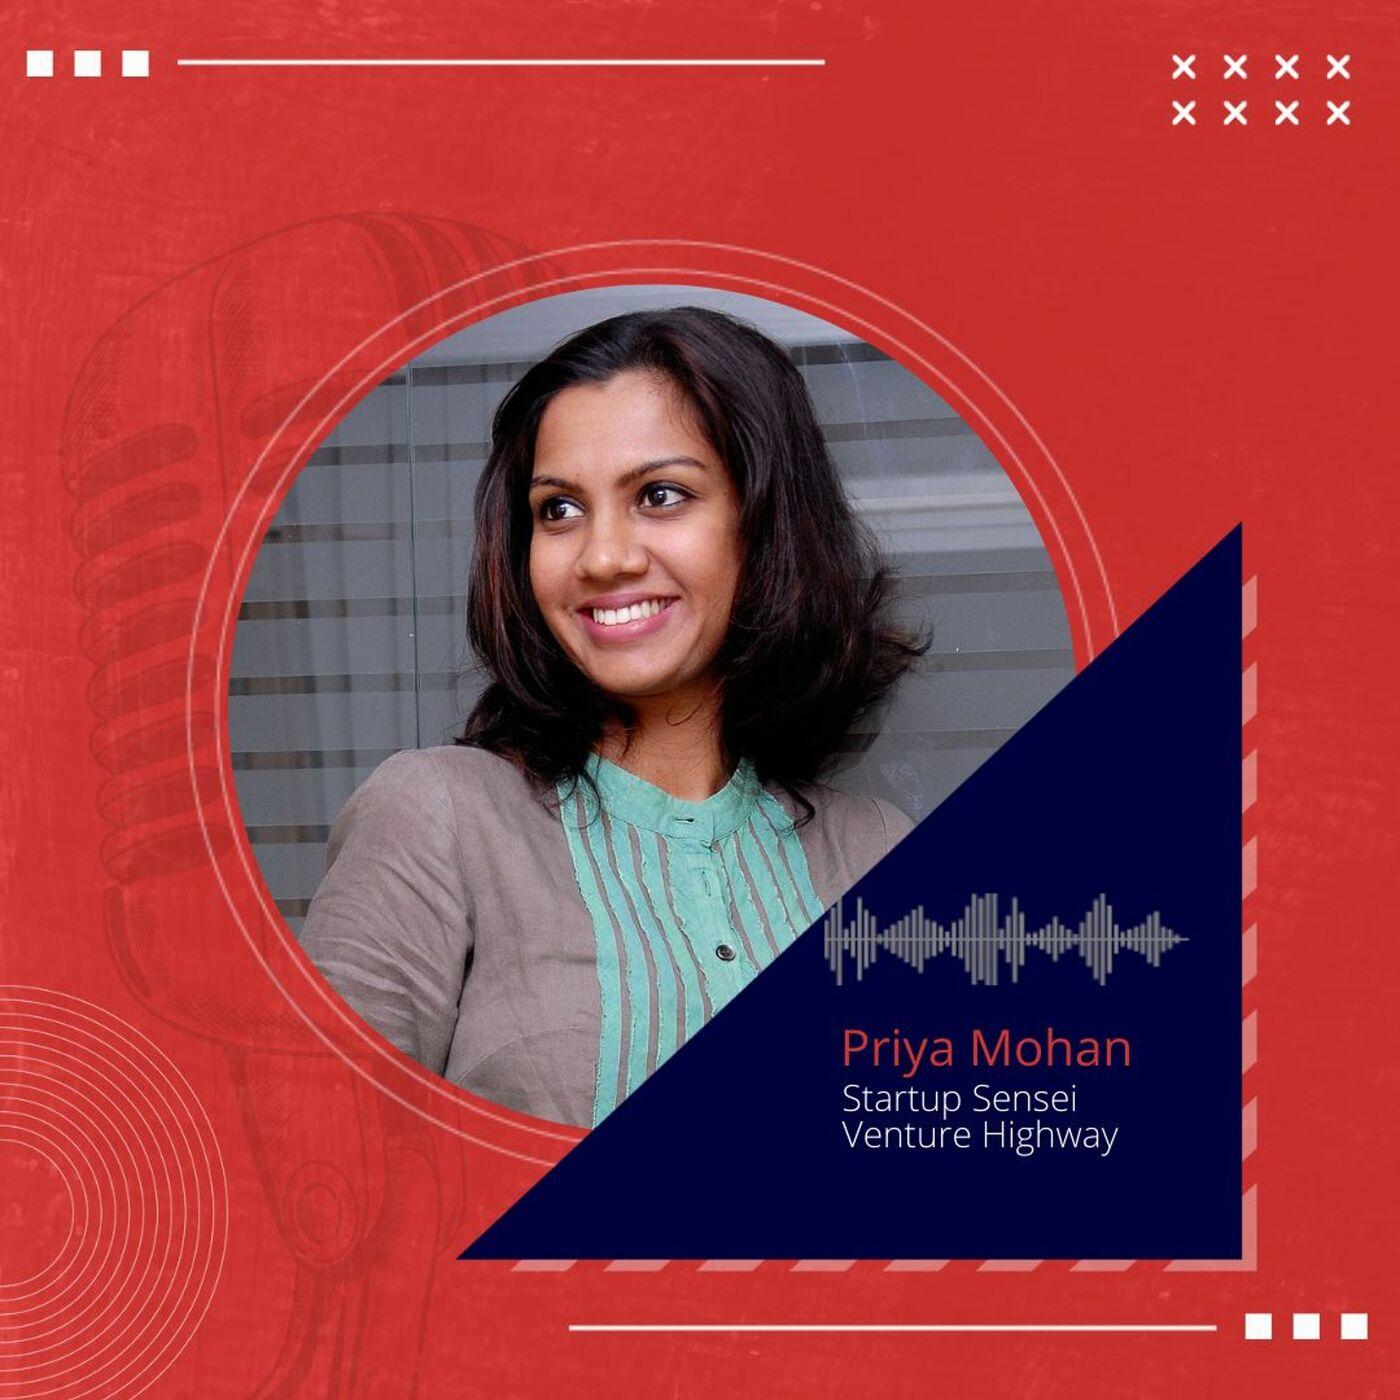 Priya Mohan, Venture Highway on breaking the glass ceiling- being a woman leader in Venture Capital